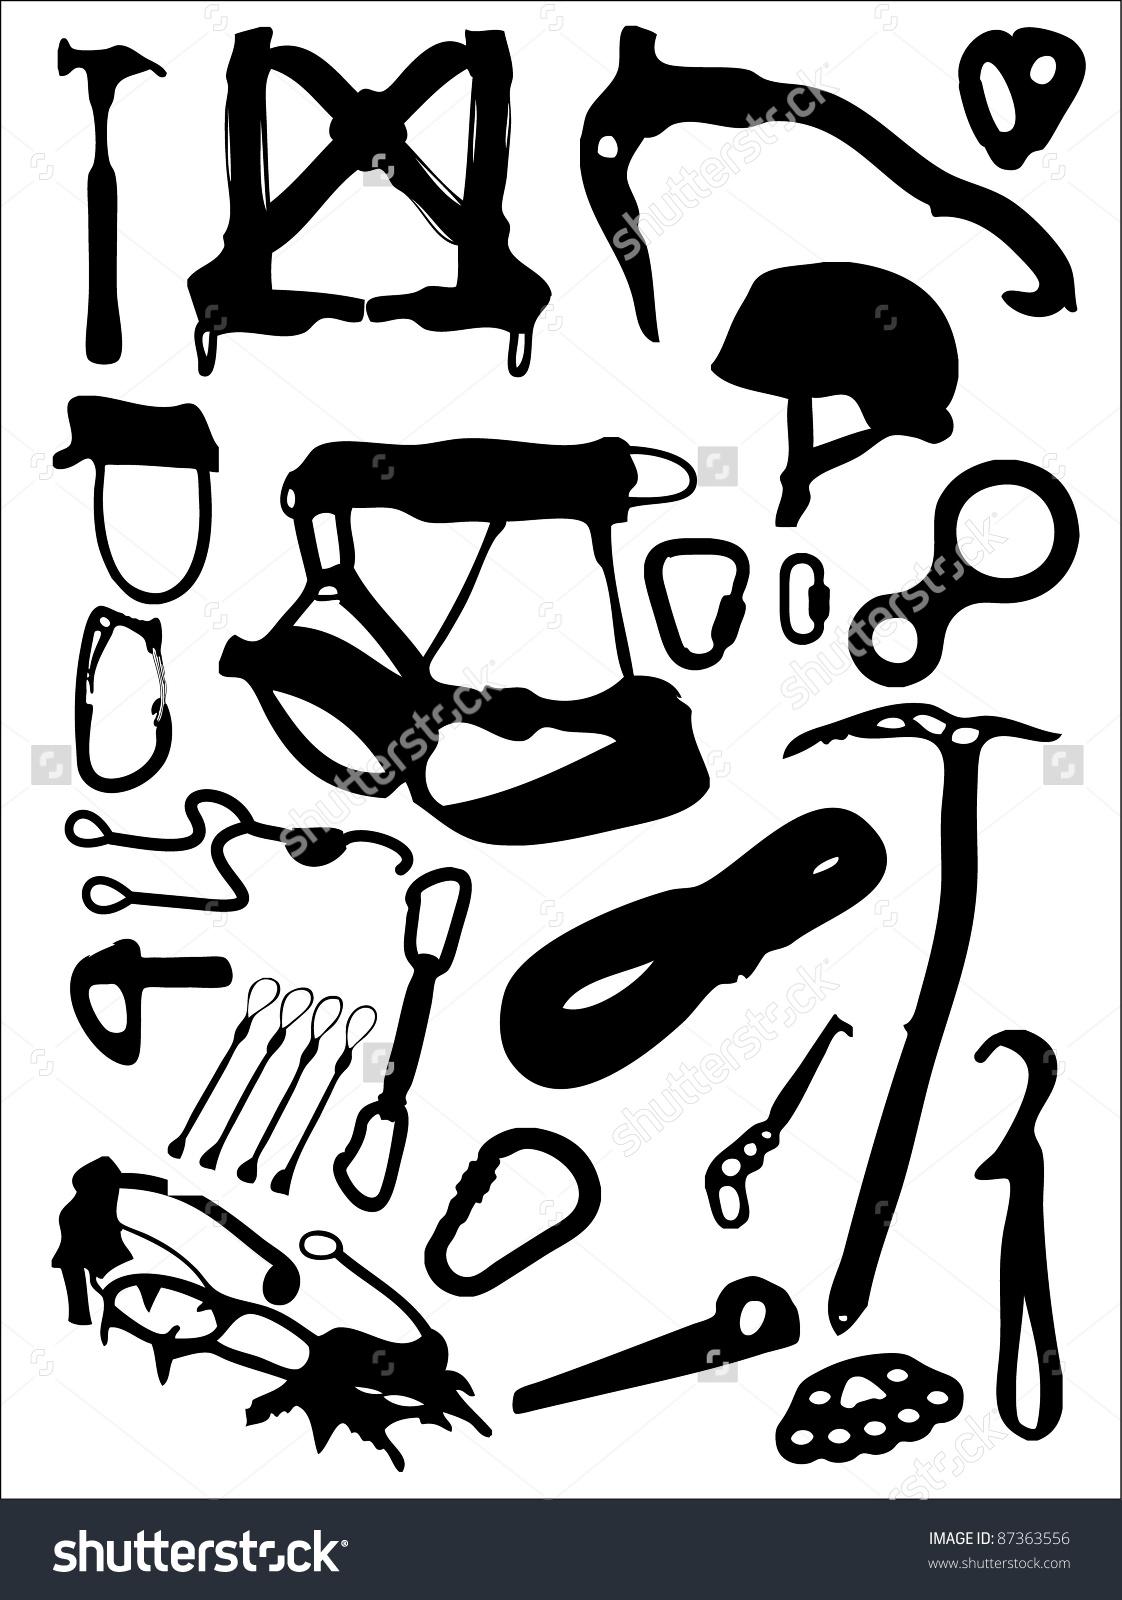 Climbing Equipment Stock Illustration 87363556.